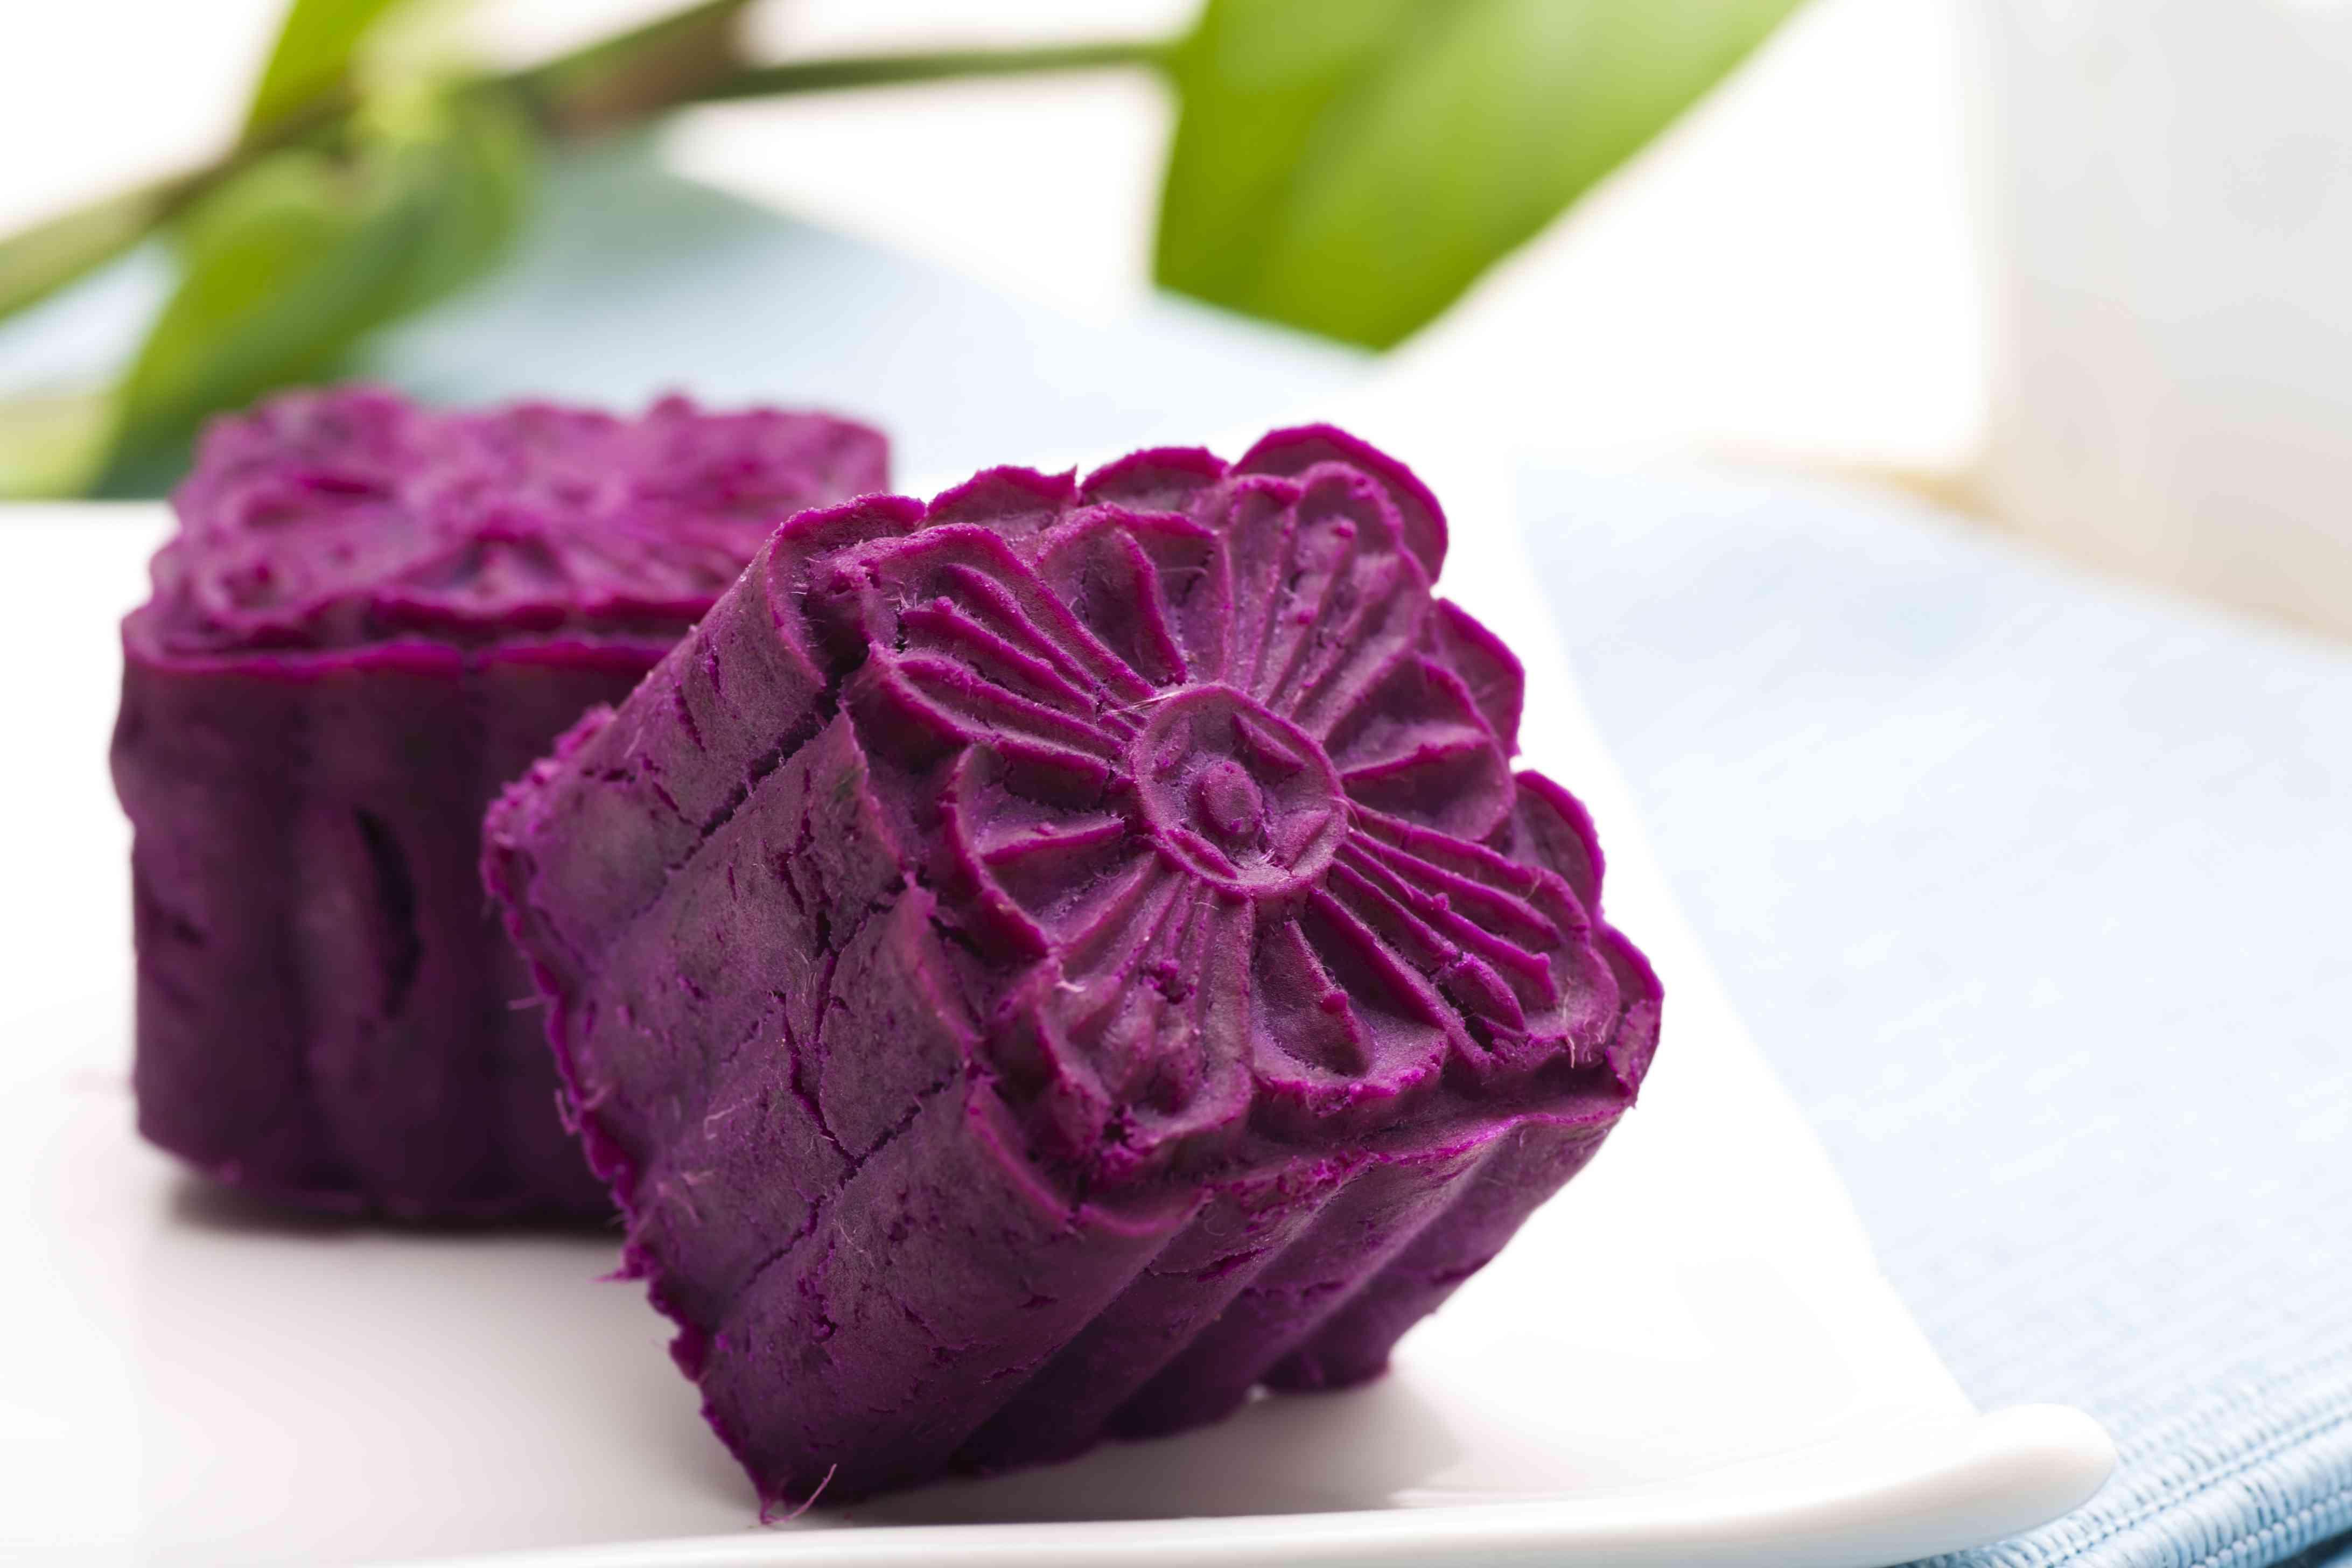 Cakes made of purple sweet potatoes